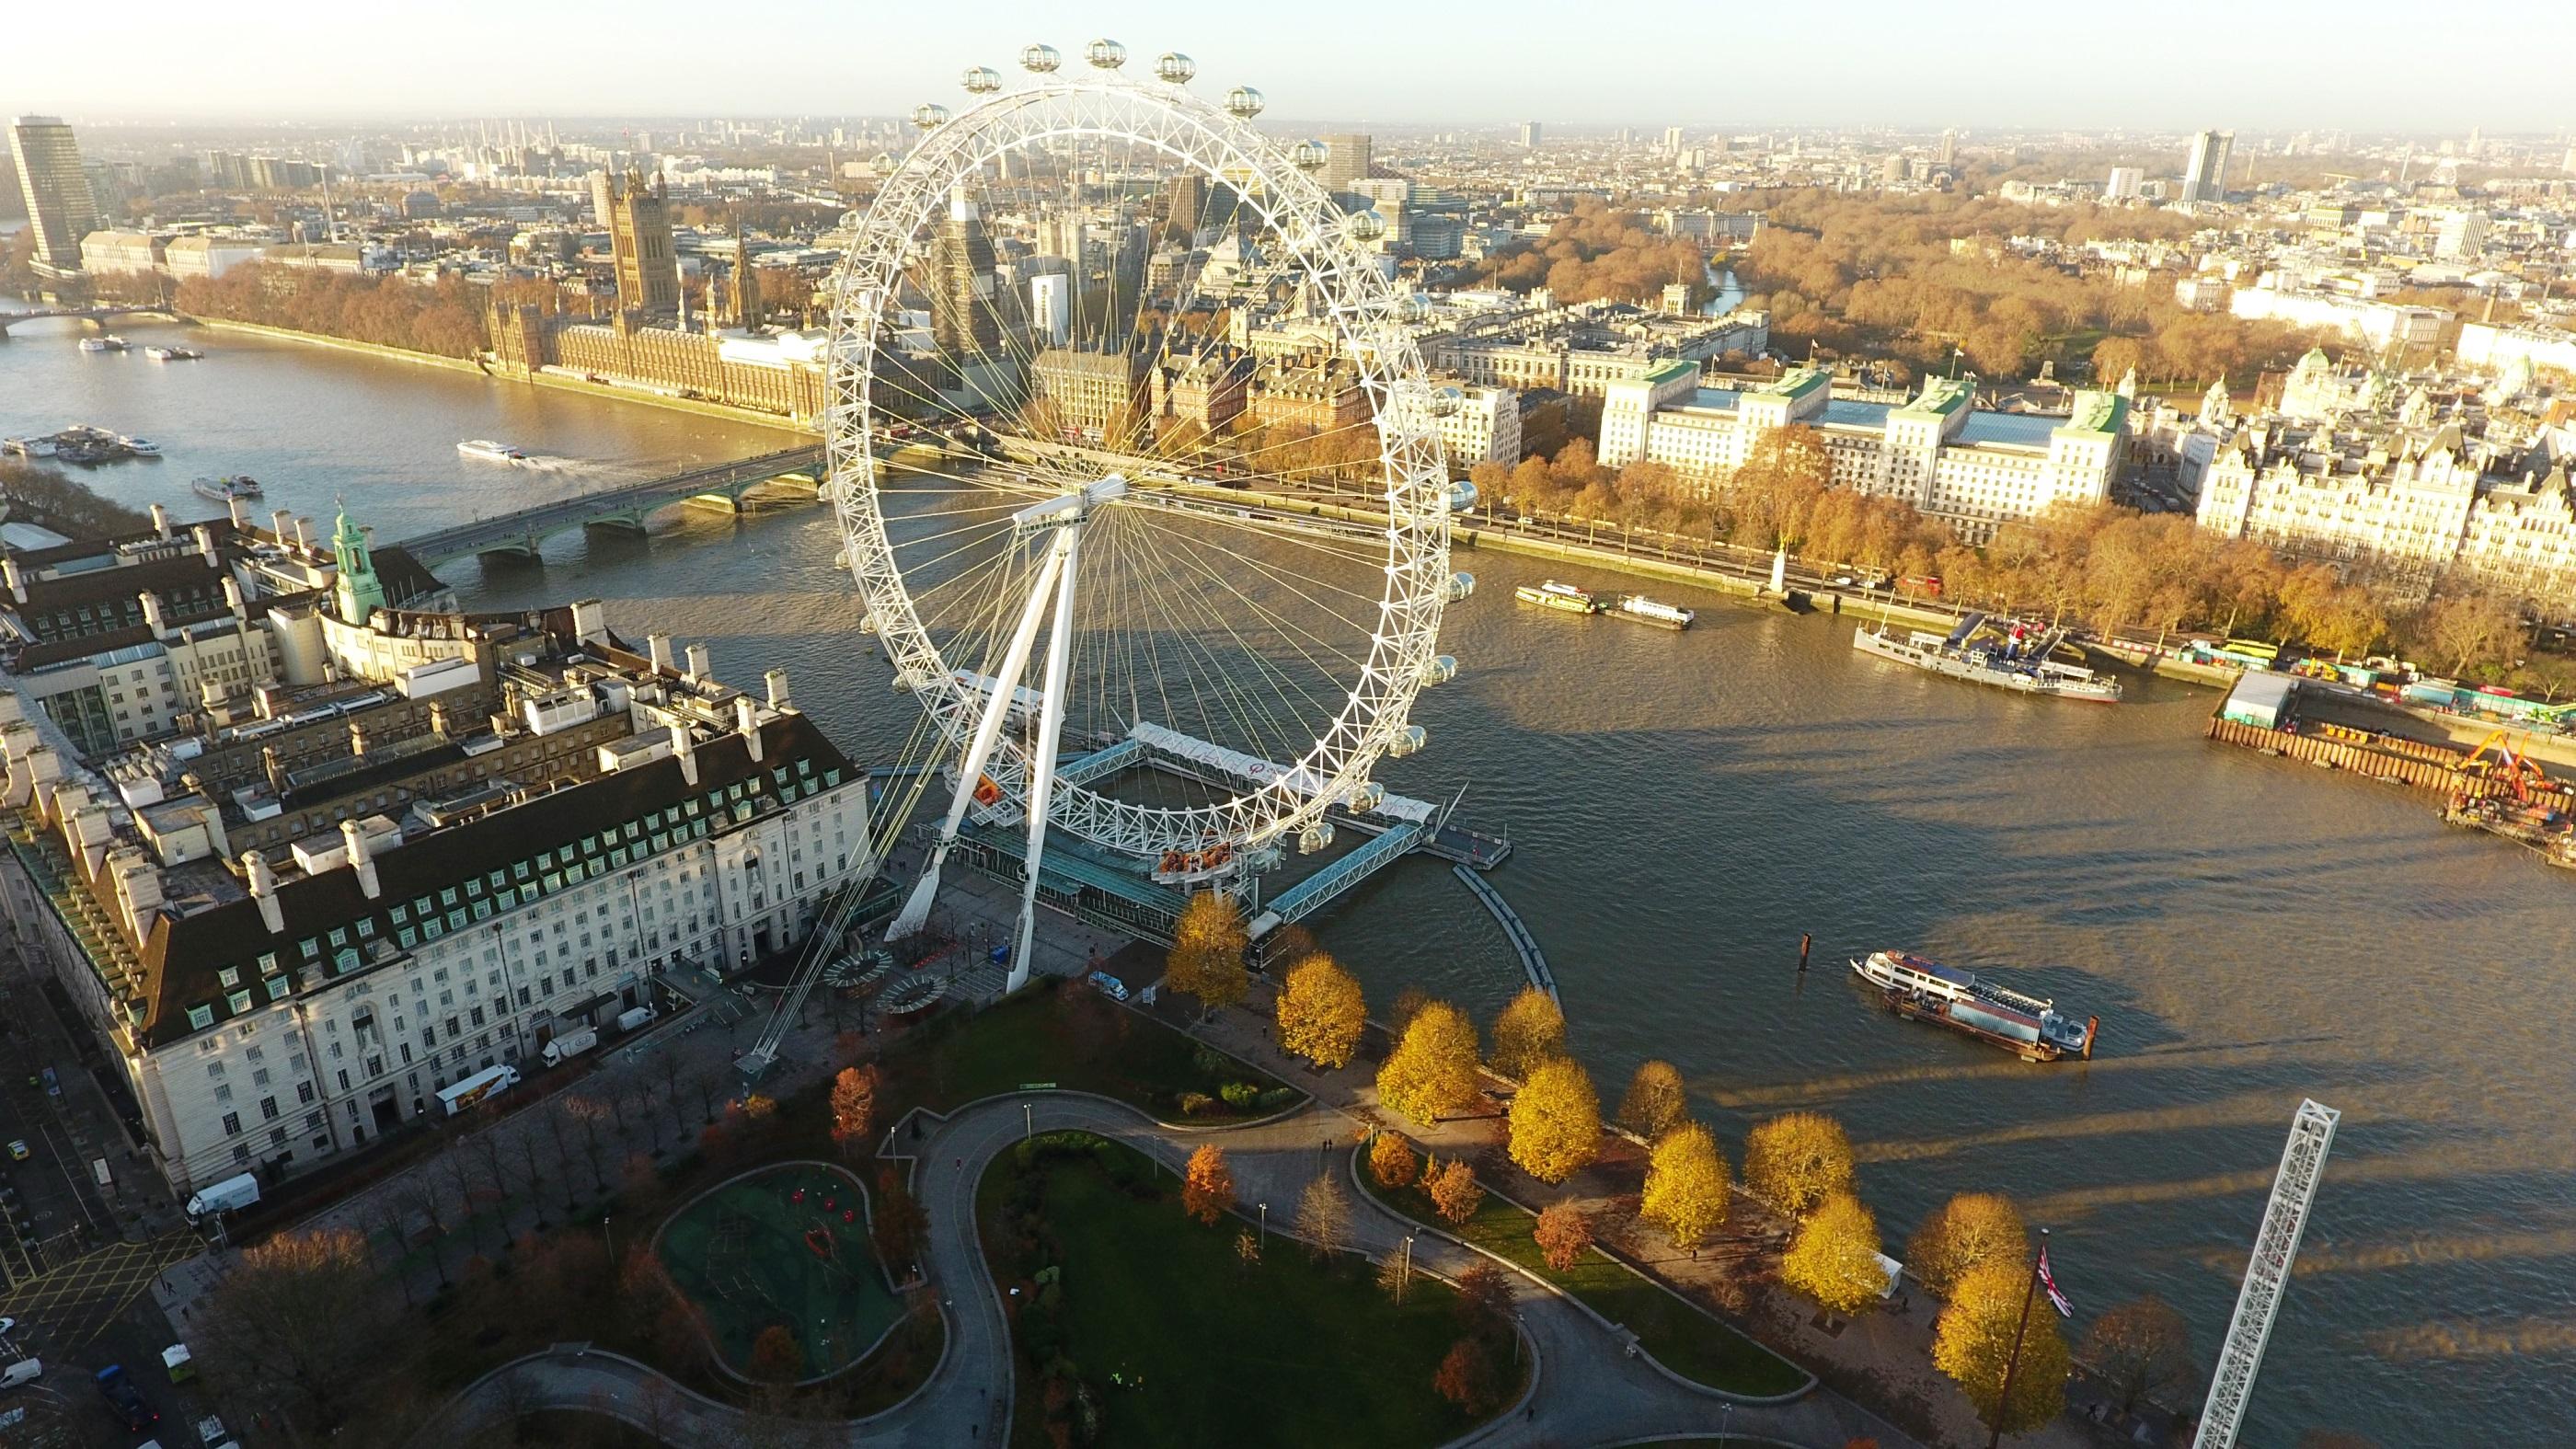 Sadiq Khan Takes Aim at London's Housing Crisis